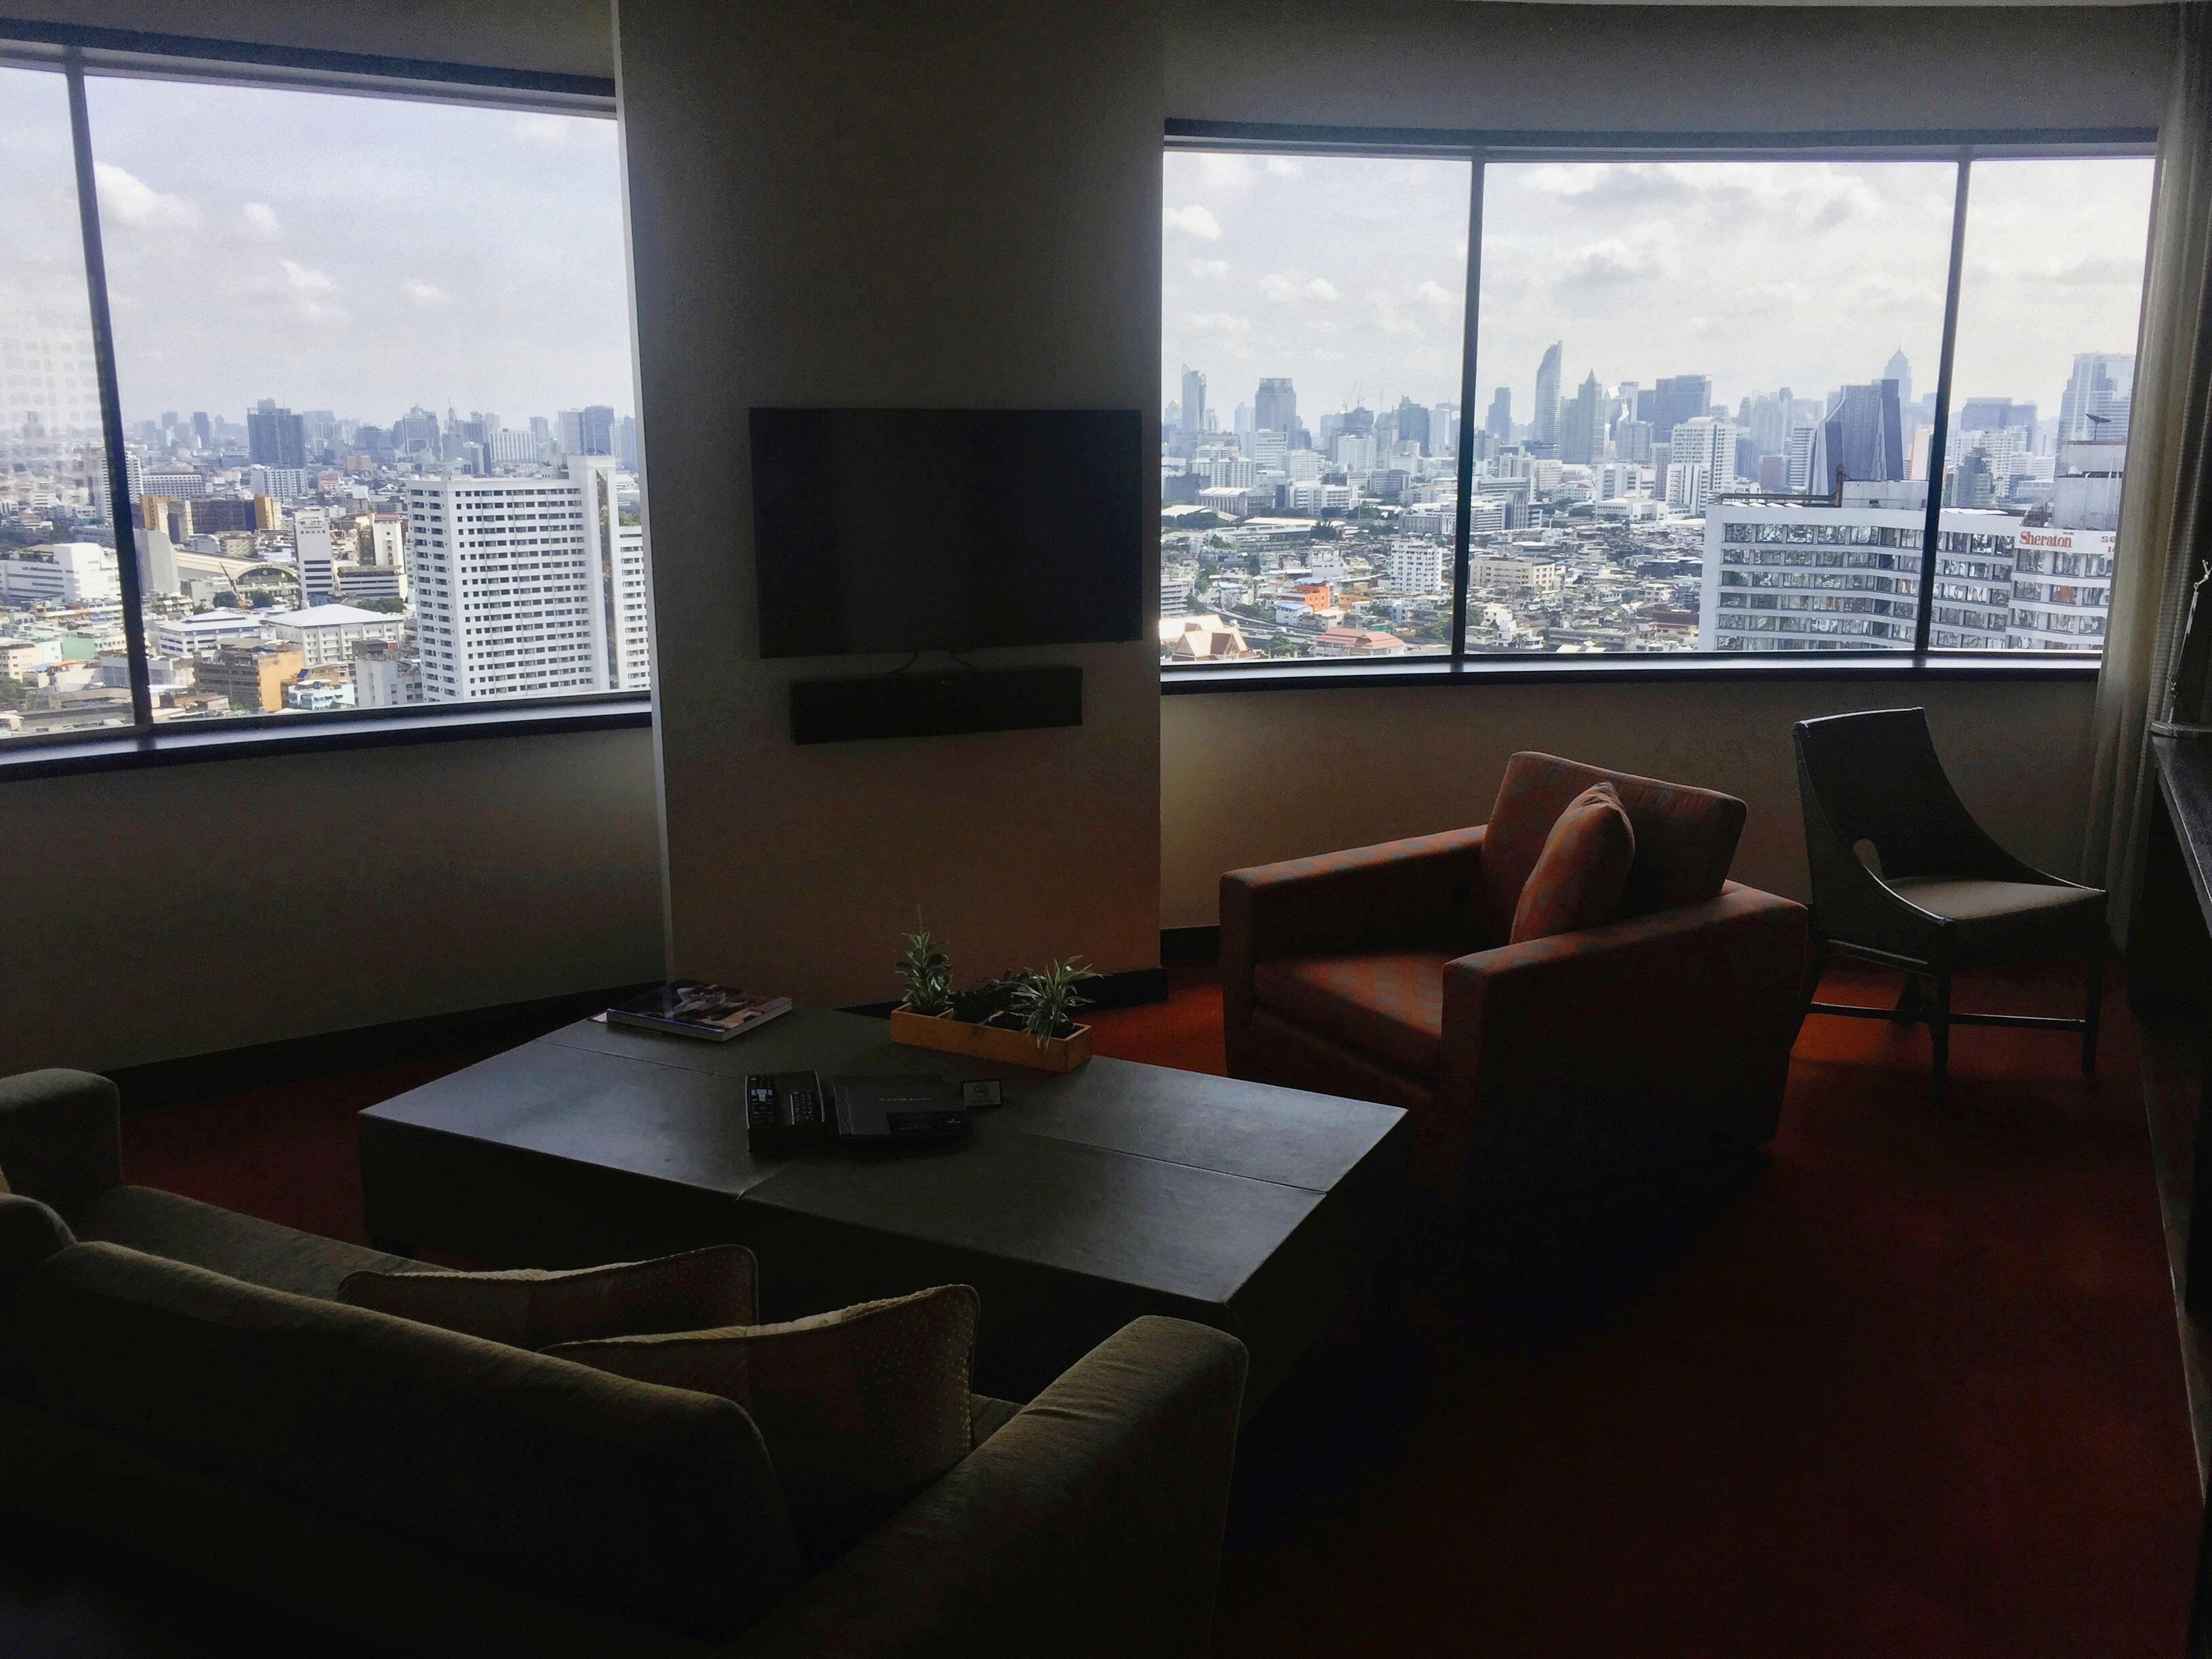 InsideFlyer Wochenrückblick Hilton Millennium Bangkok